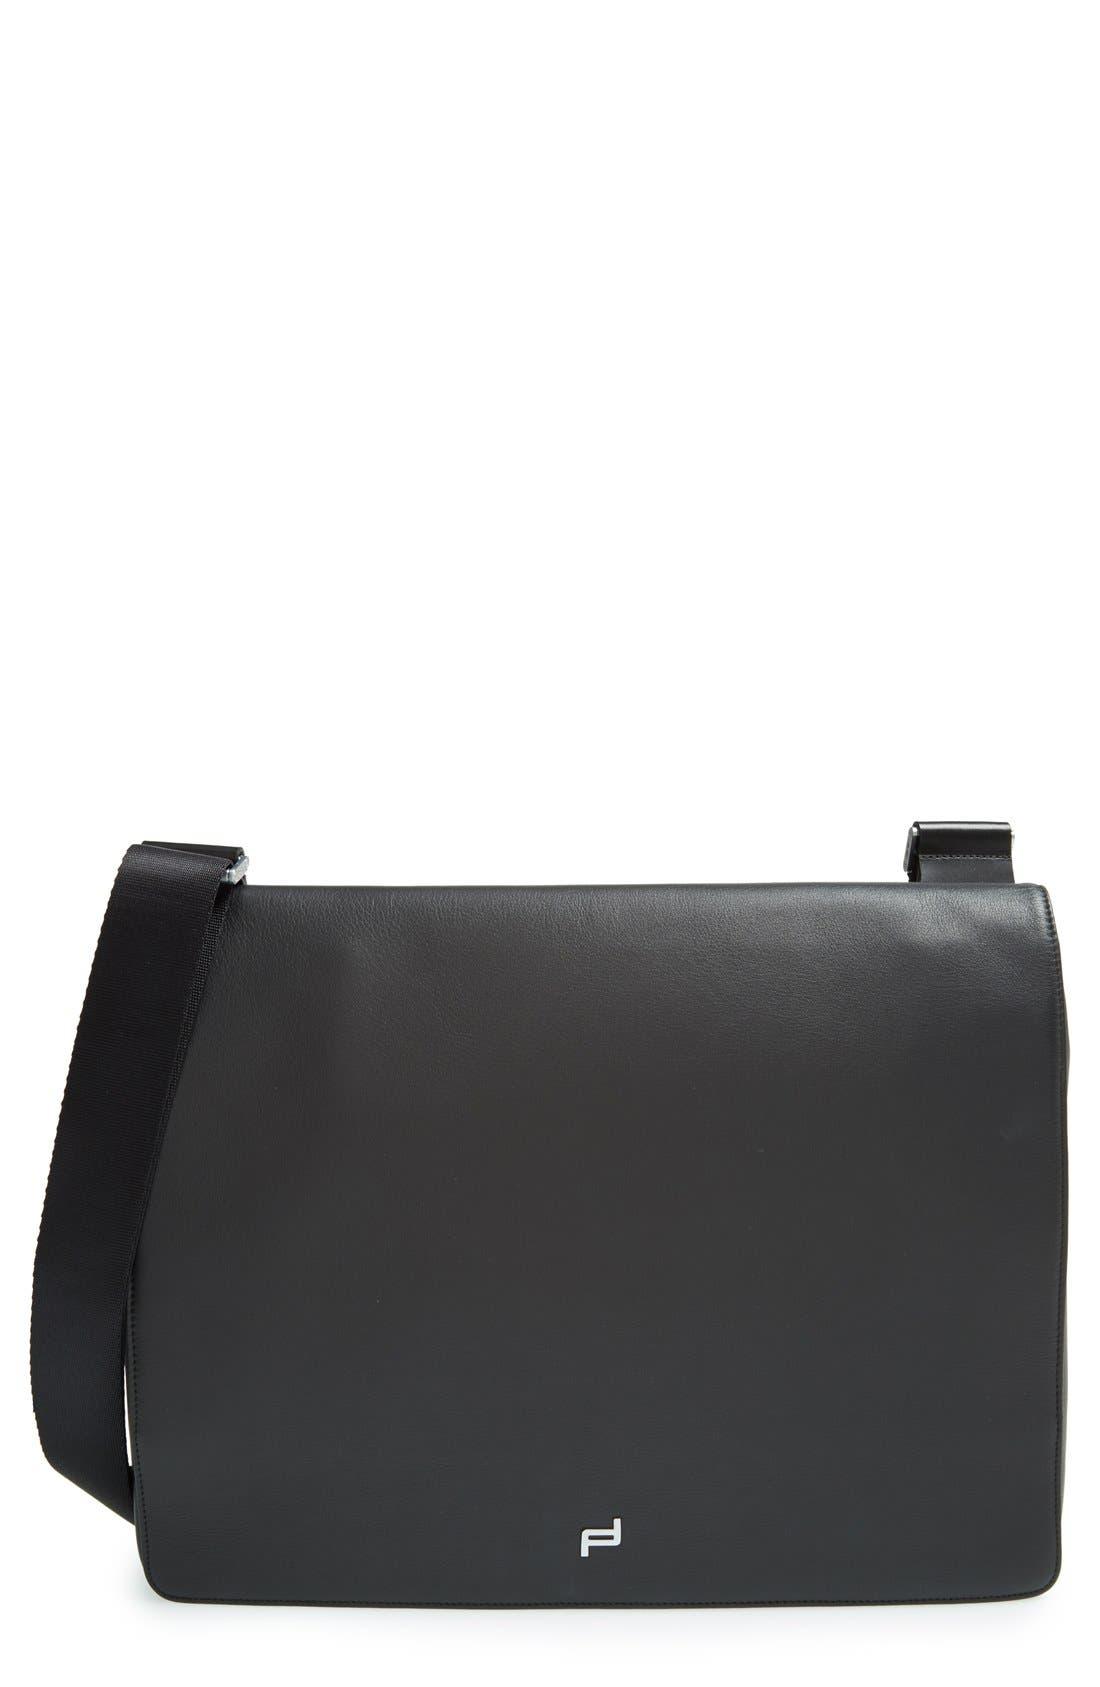 PORSCHE DESIGN 'Shyrt' Leather Messenger Bag